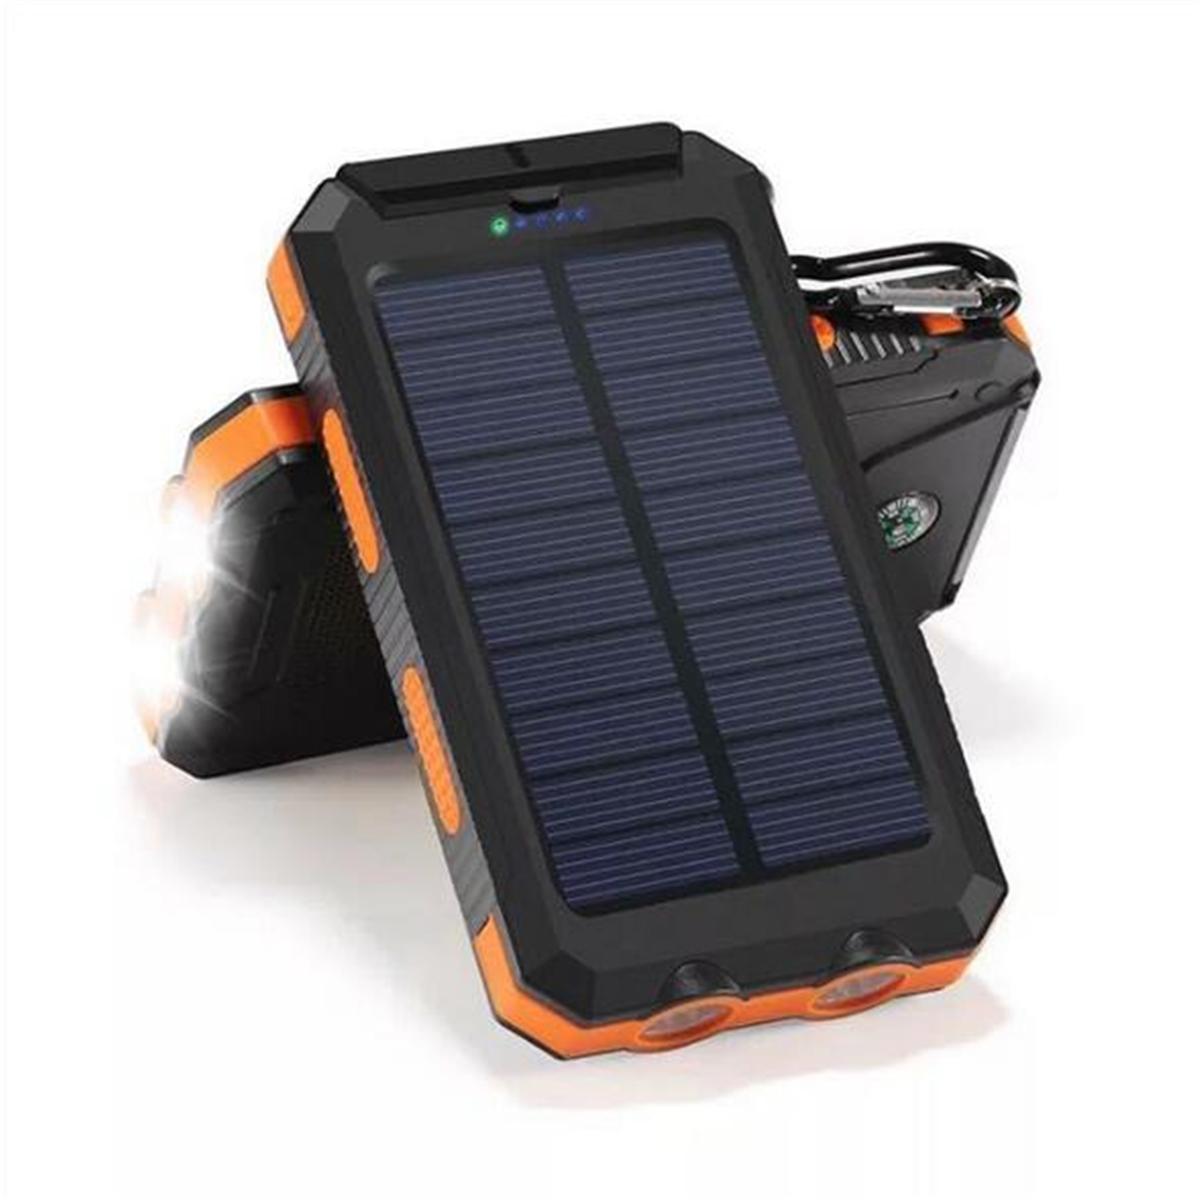 Bakeey 20000mAh Dual USB DIY Solar Power Bank Case Kit ...